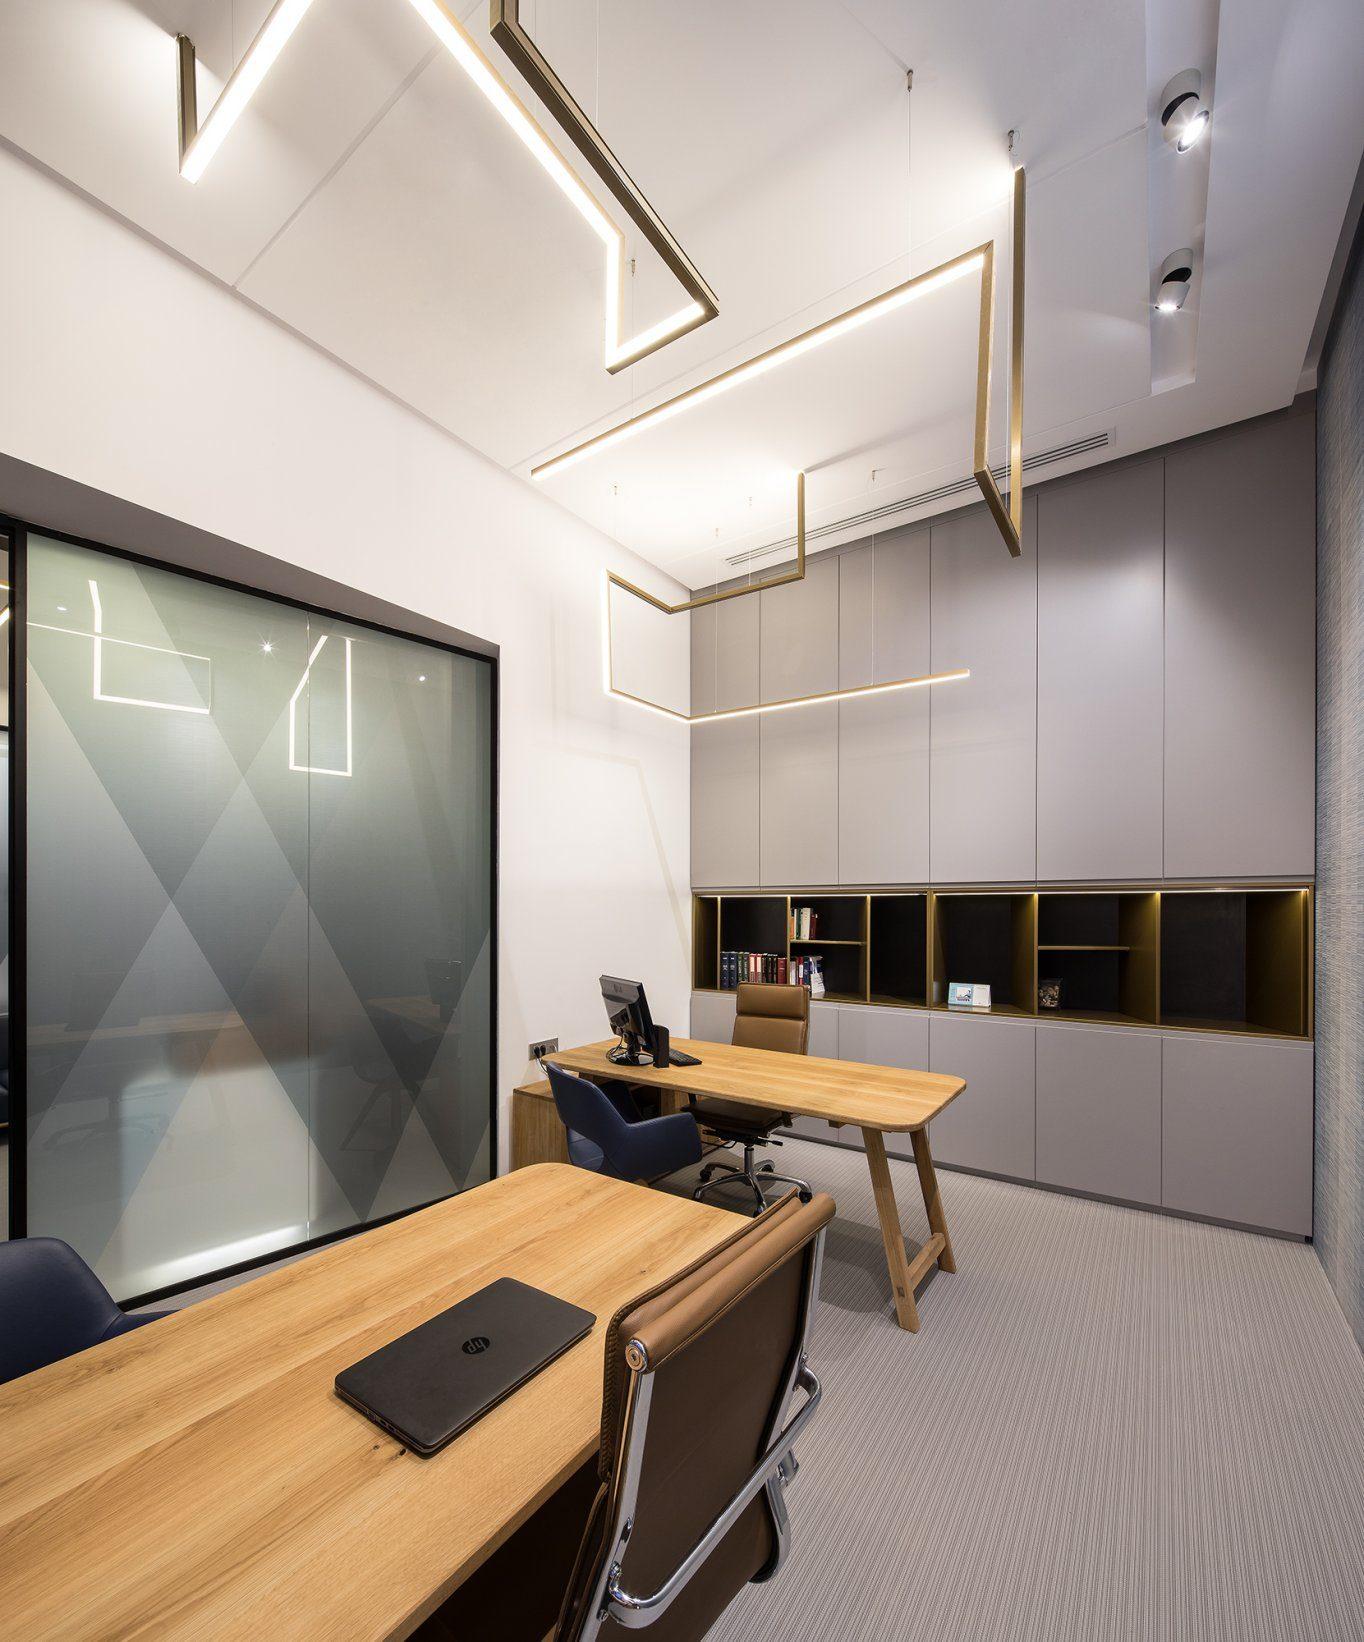 Studio3plus PREDOI si Asociatii (5)